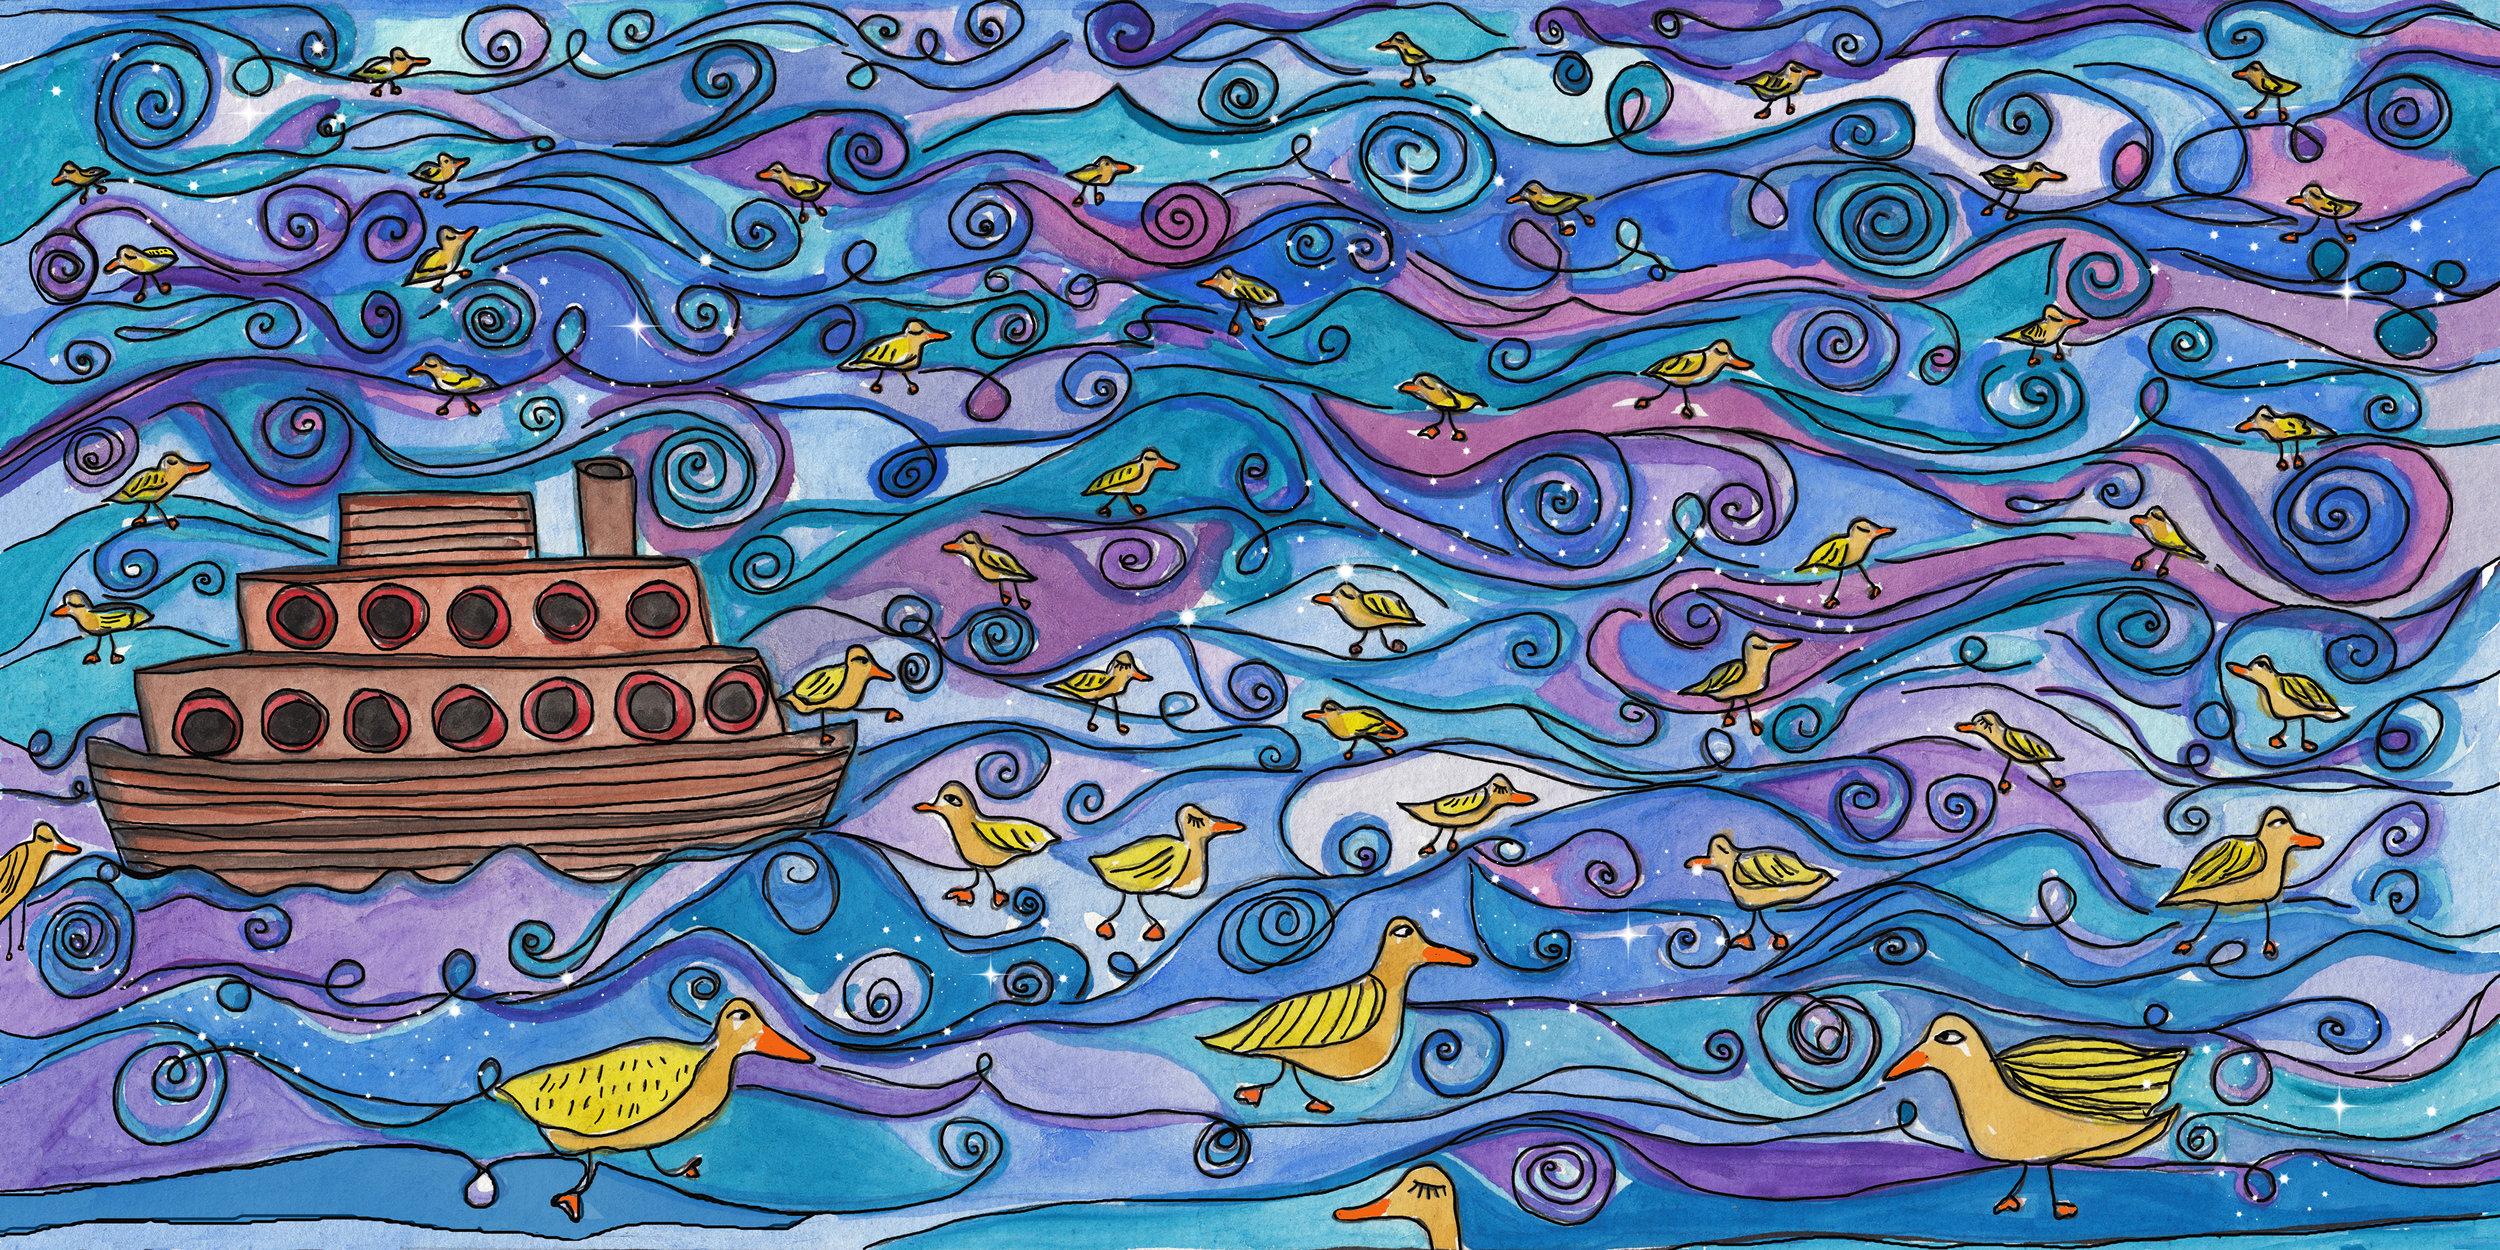 Illustration by Nichla Smith